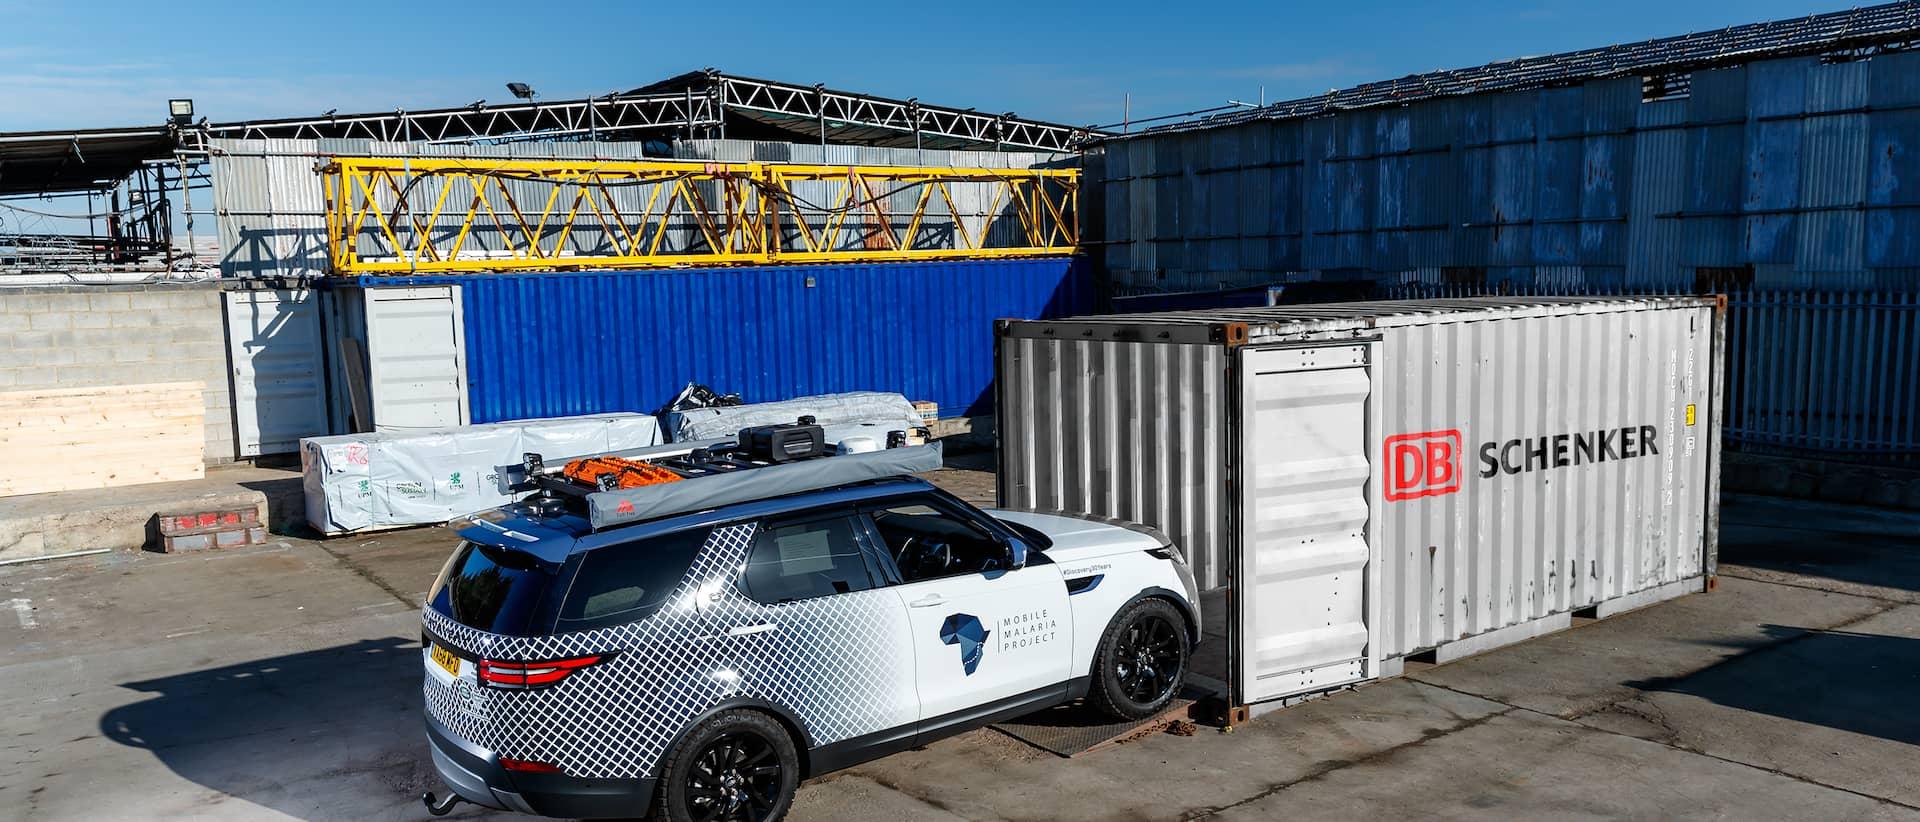 DB Schenker in United Arab Emirates   Global Logistics